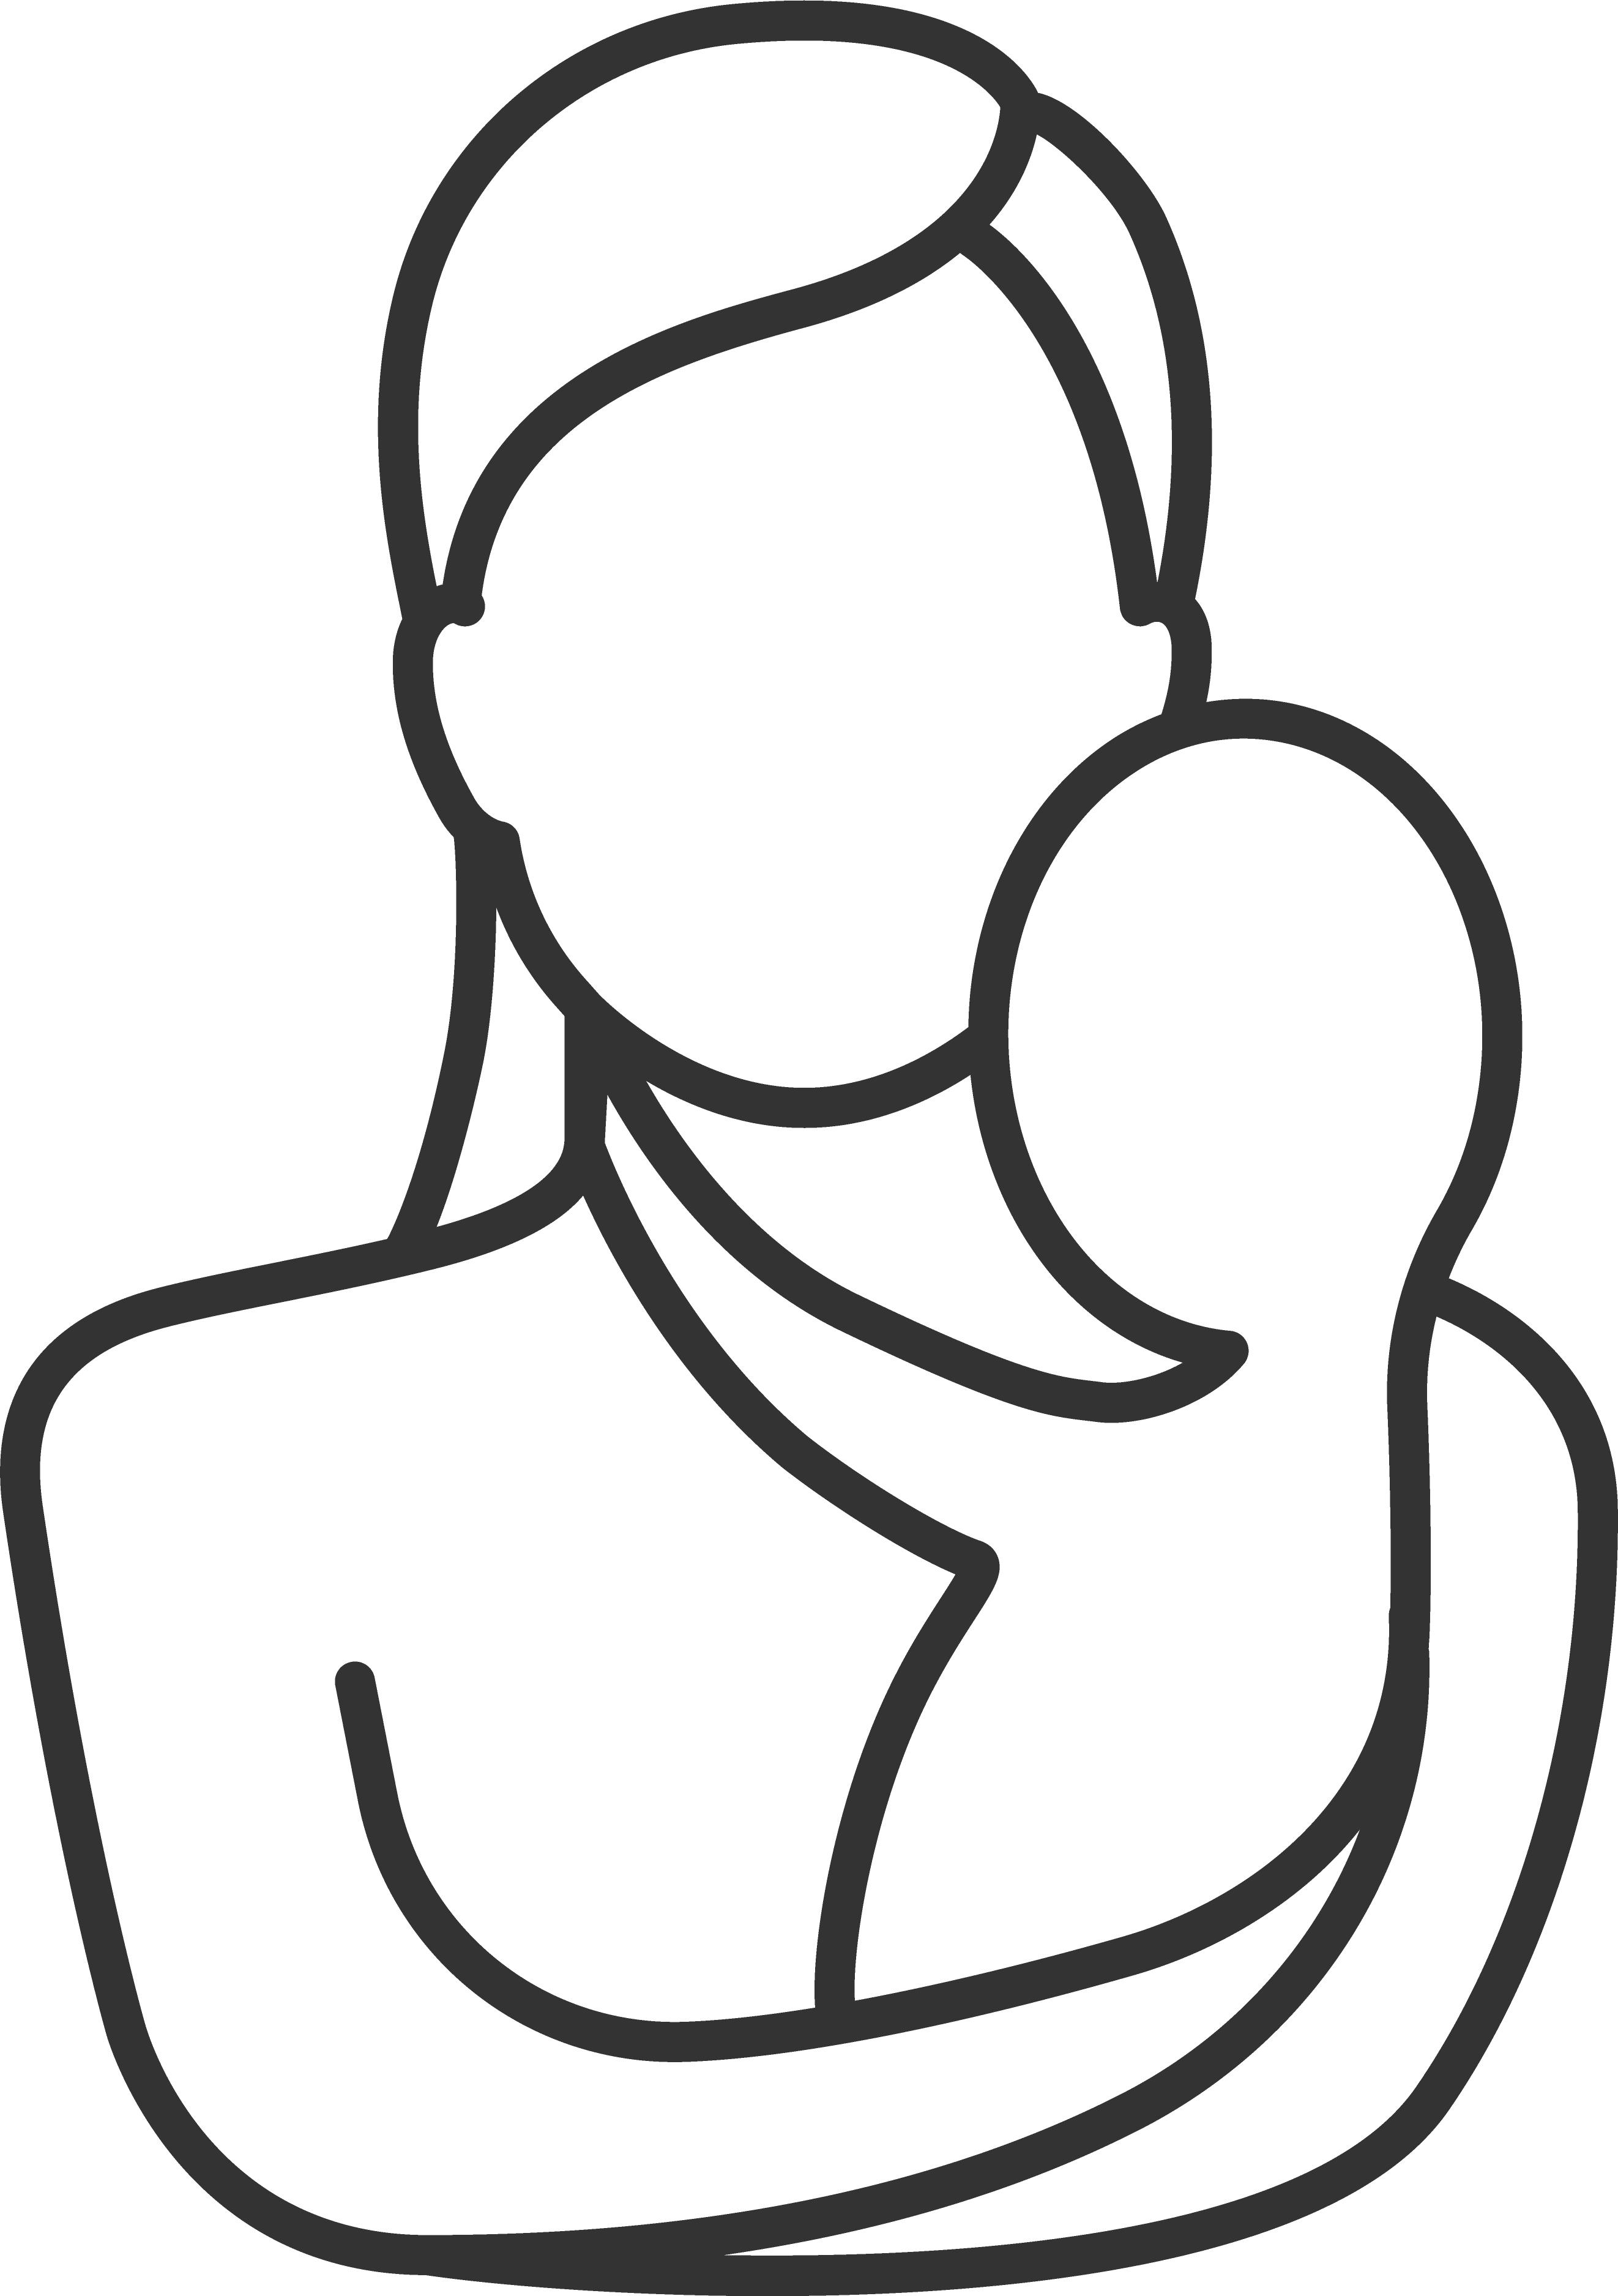 Pro Mater Sano e.V. - Hilfe für krebskranke Mütter mit Babys oder Kleinkindern